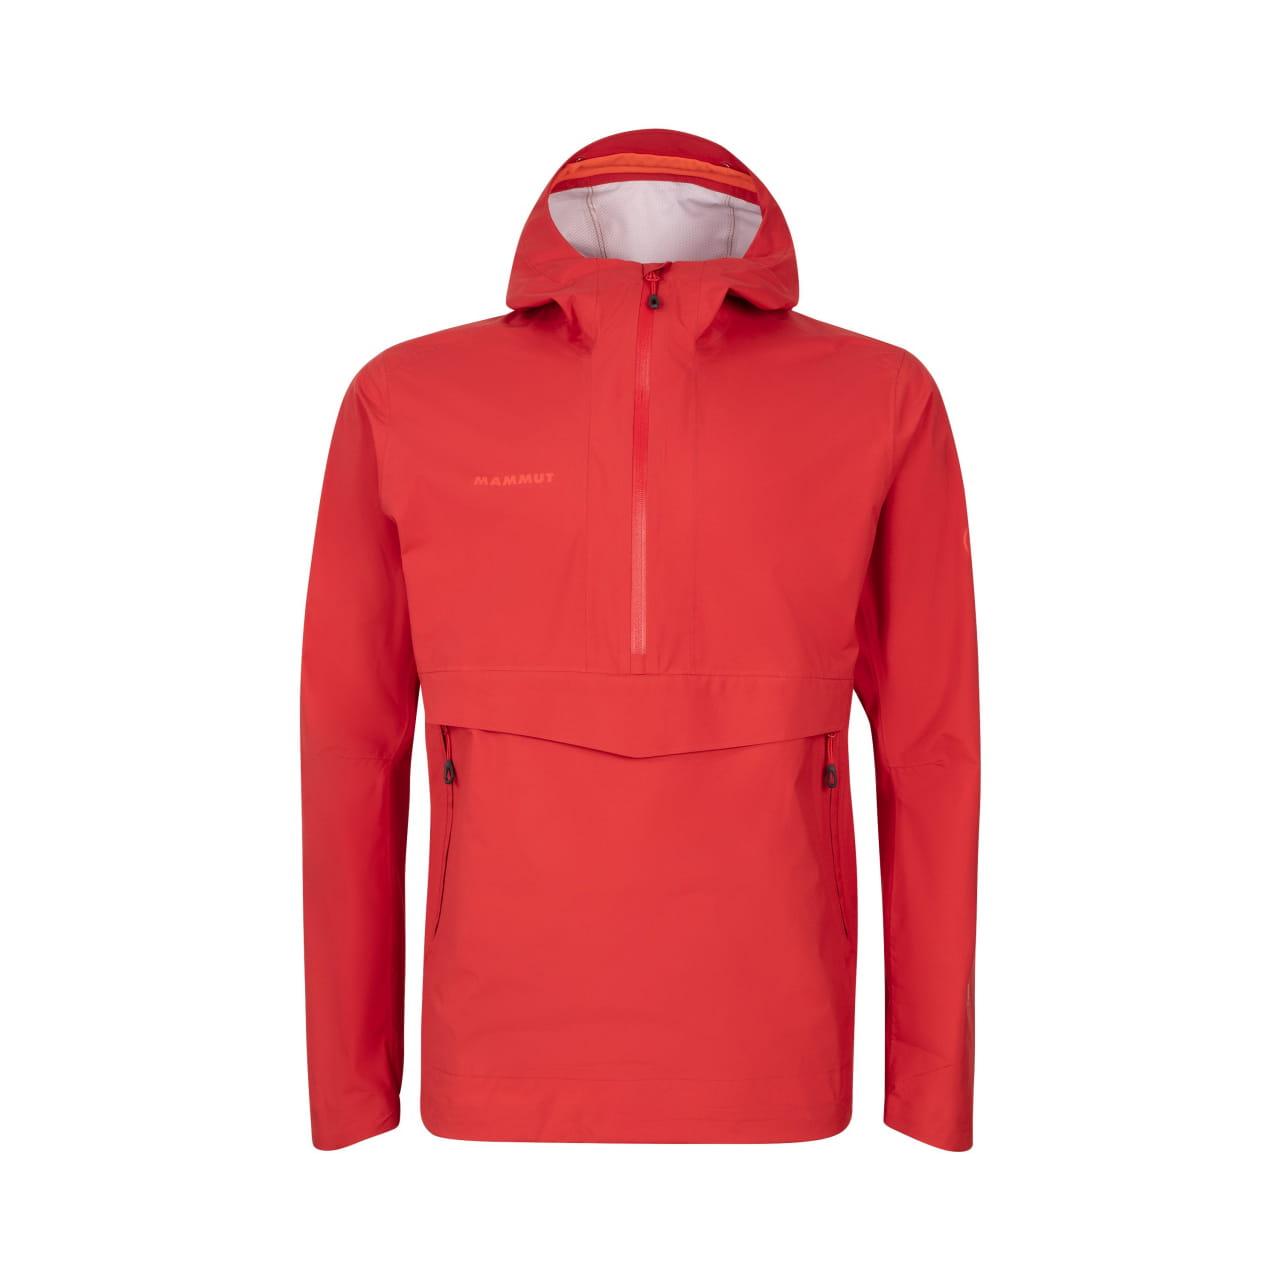 Pánská bunda s kapucí Mammut Albula Half Zip HS Hooded Jacket Men